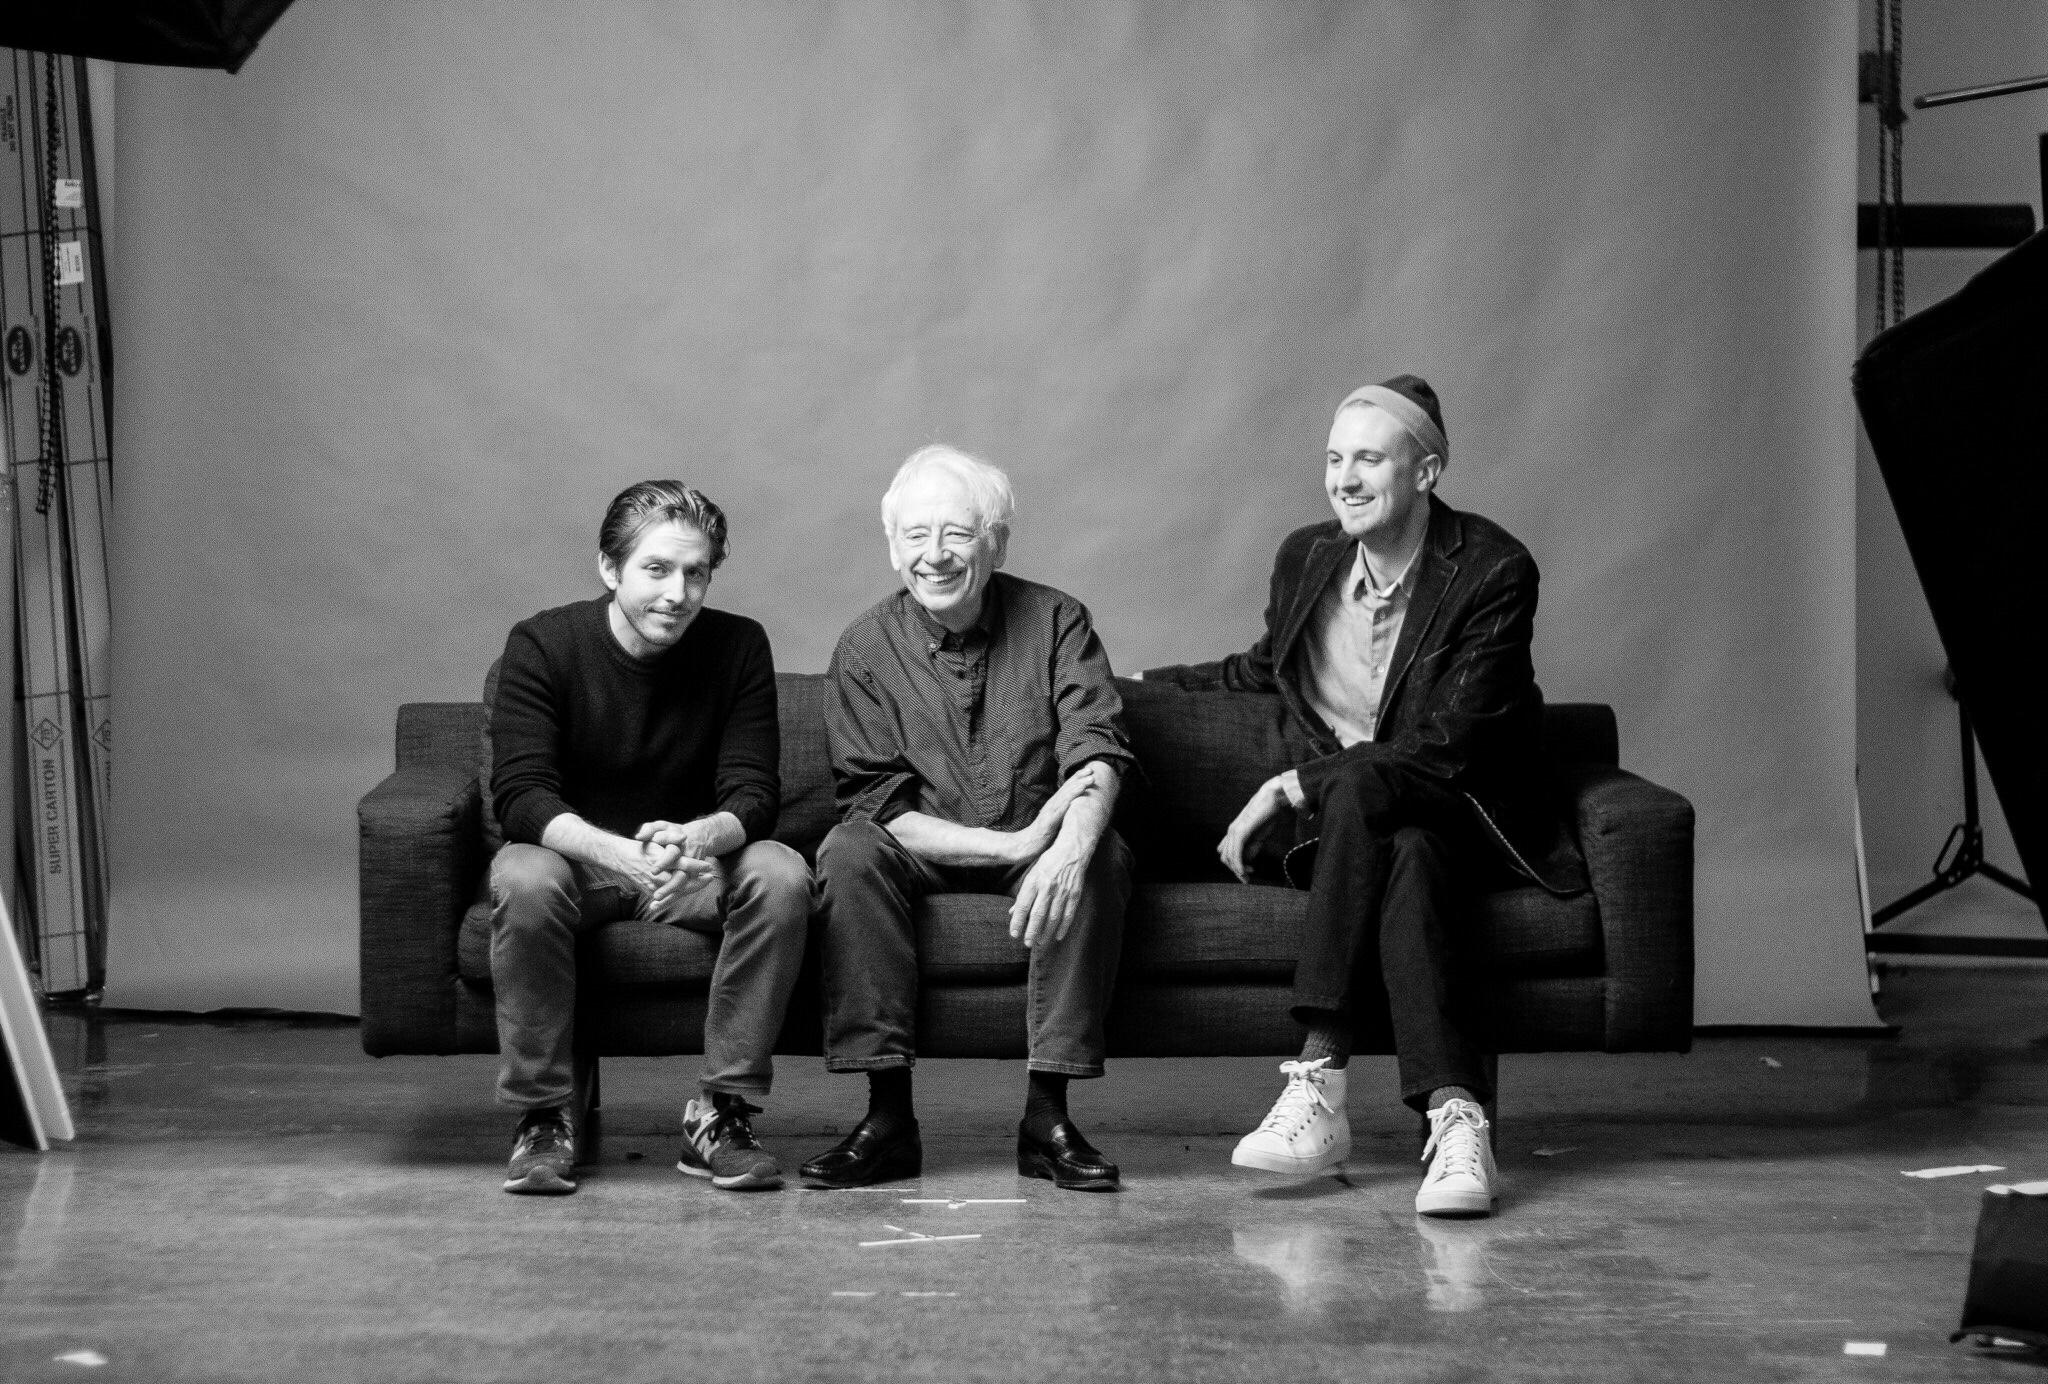 Torrey Townsend, Austin Pendleton, and Knud Adams